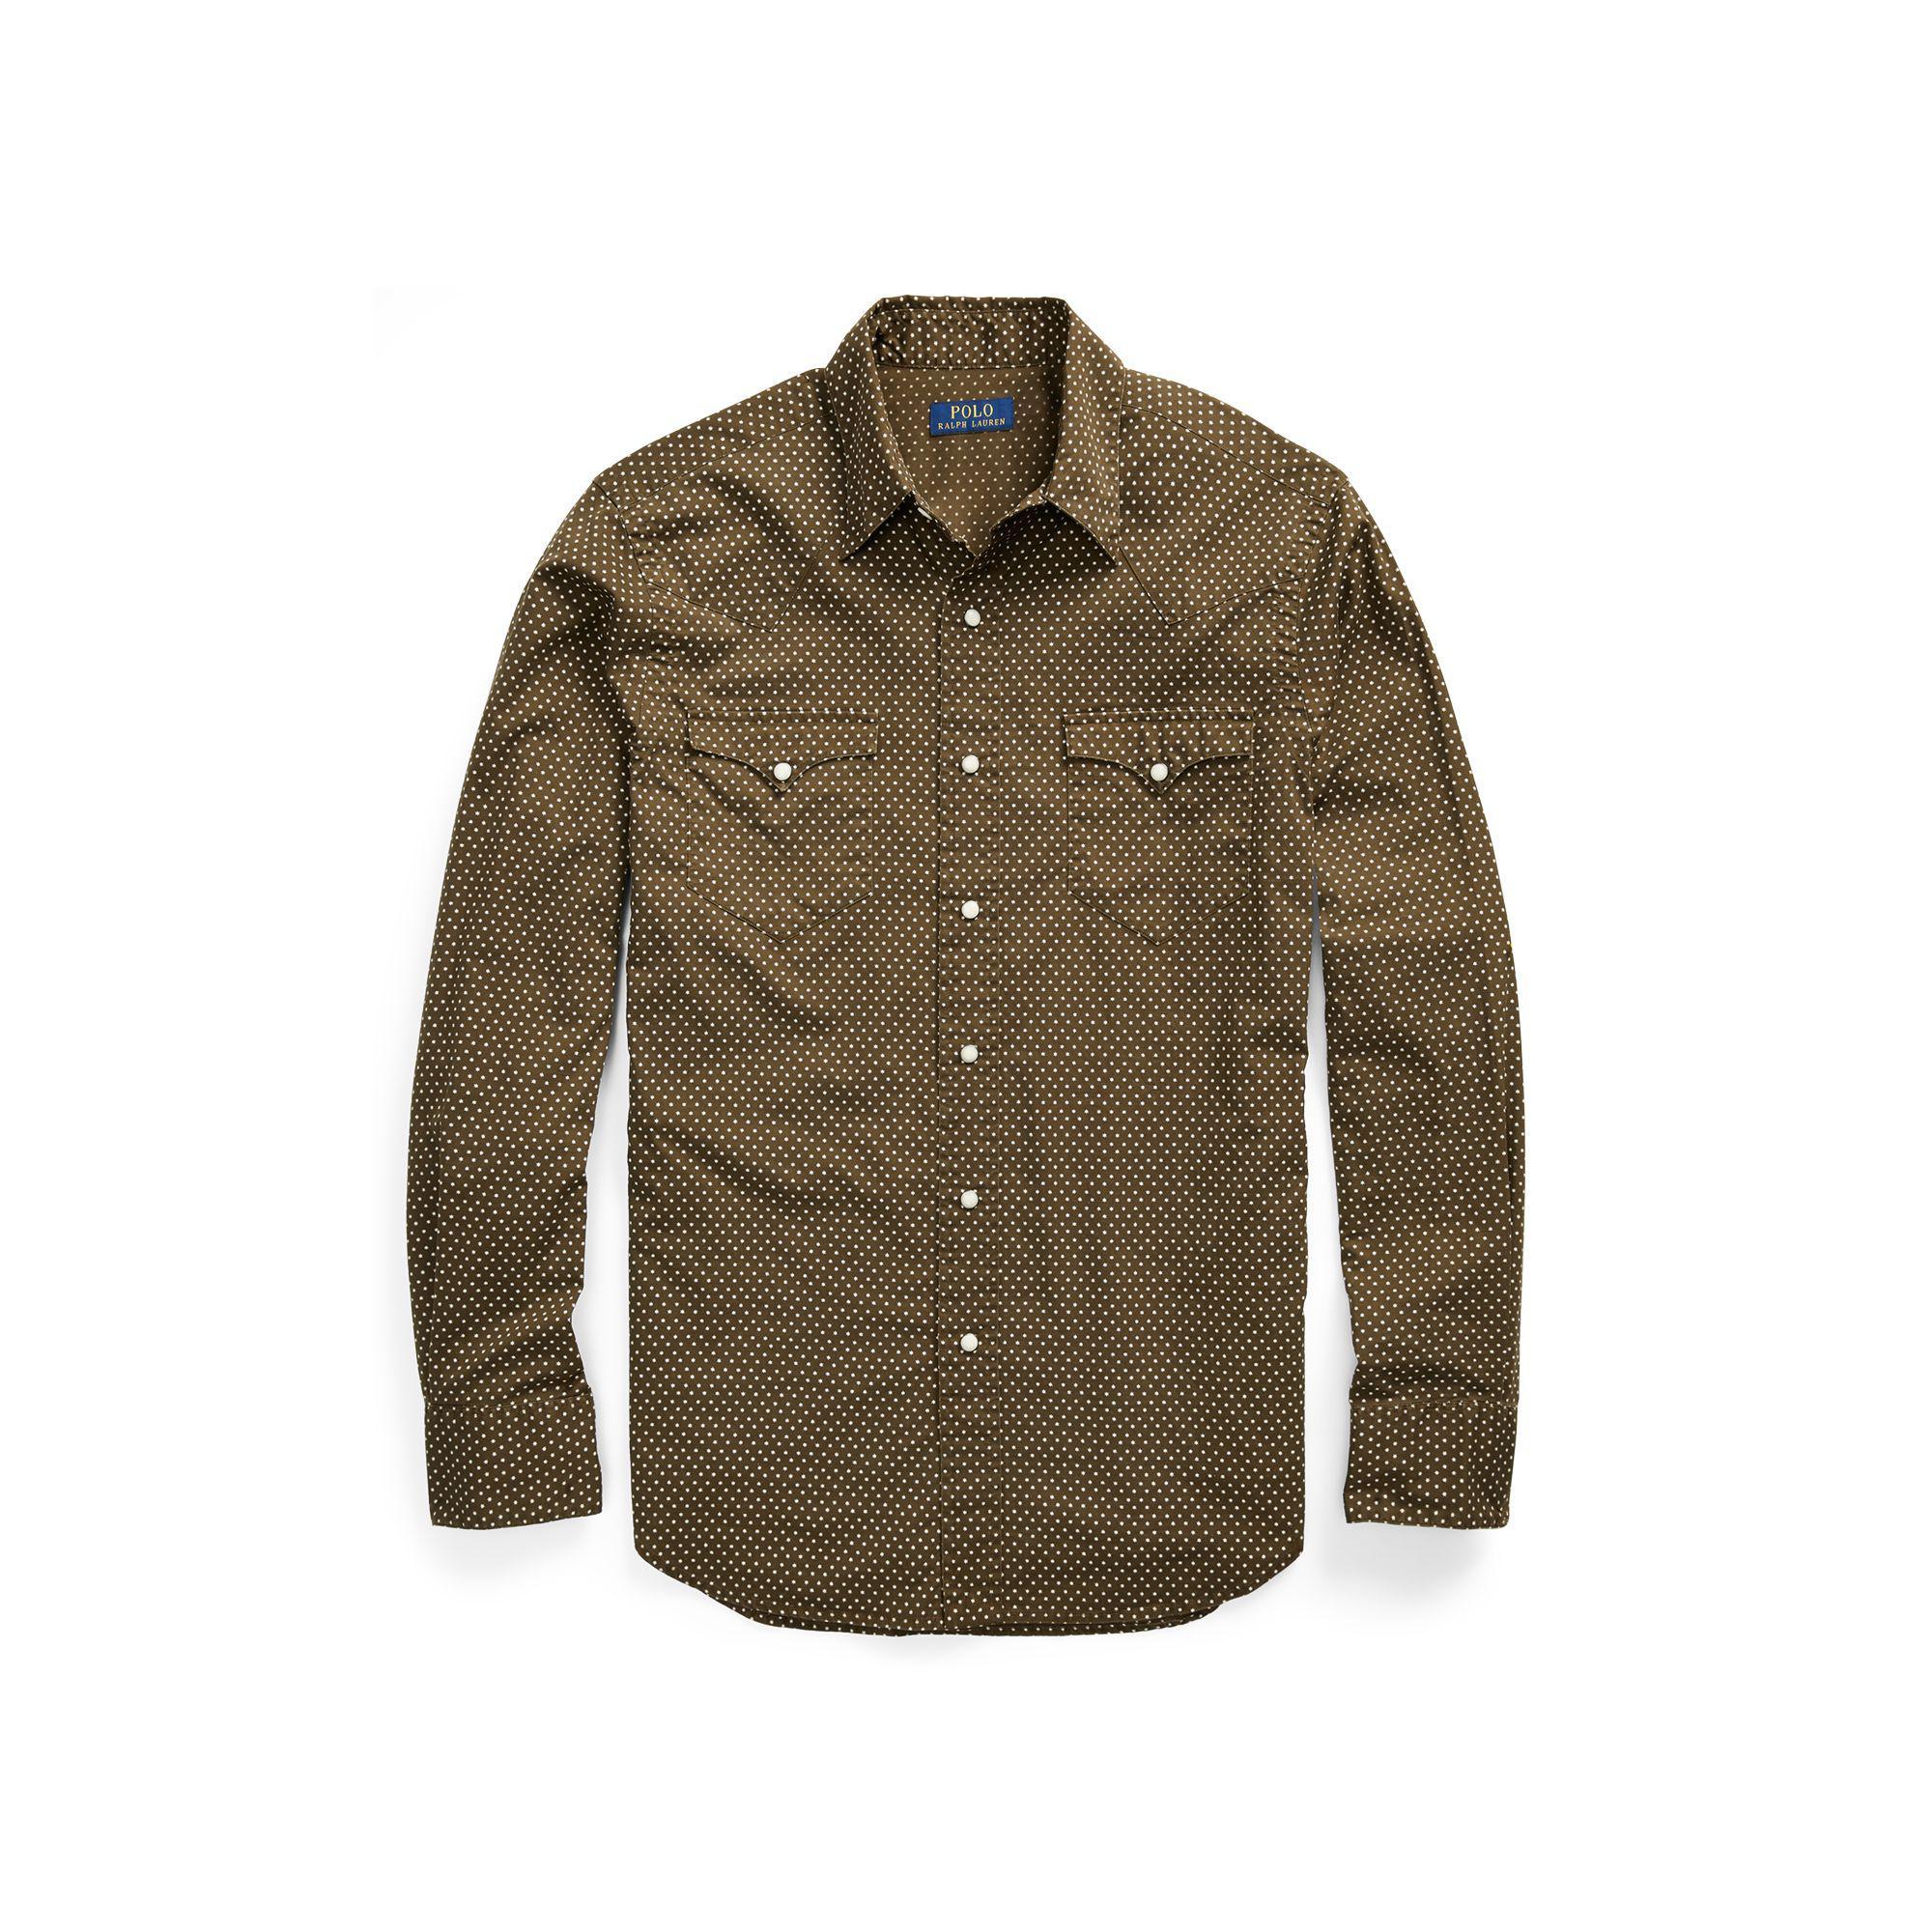 66c8beac Polo Ralph Lauren Classic Fit Star Twill Shirt for Men - Lyst